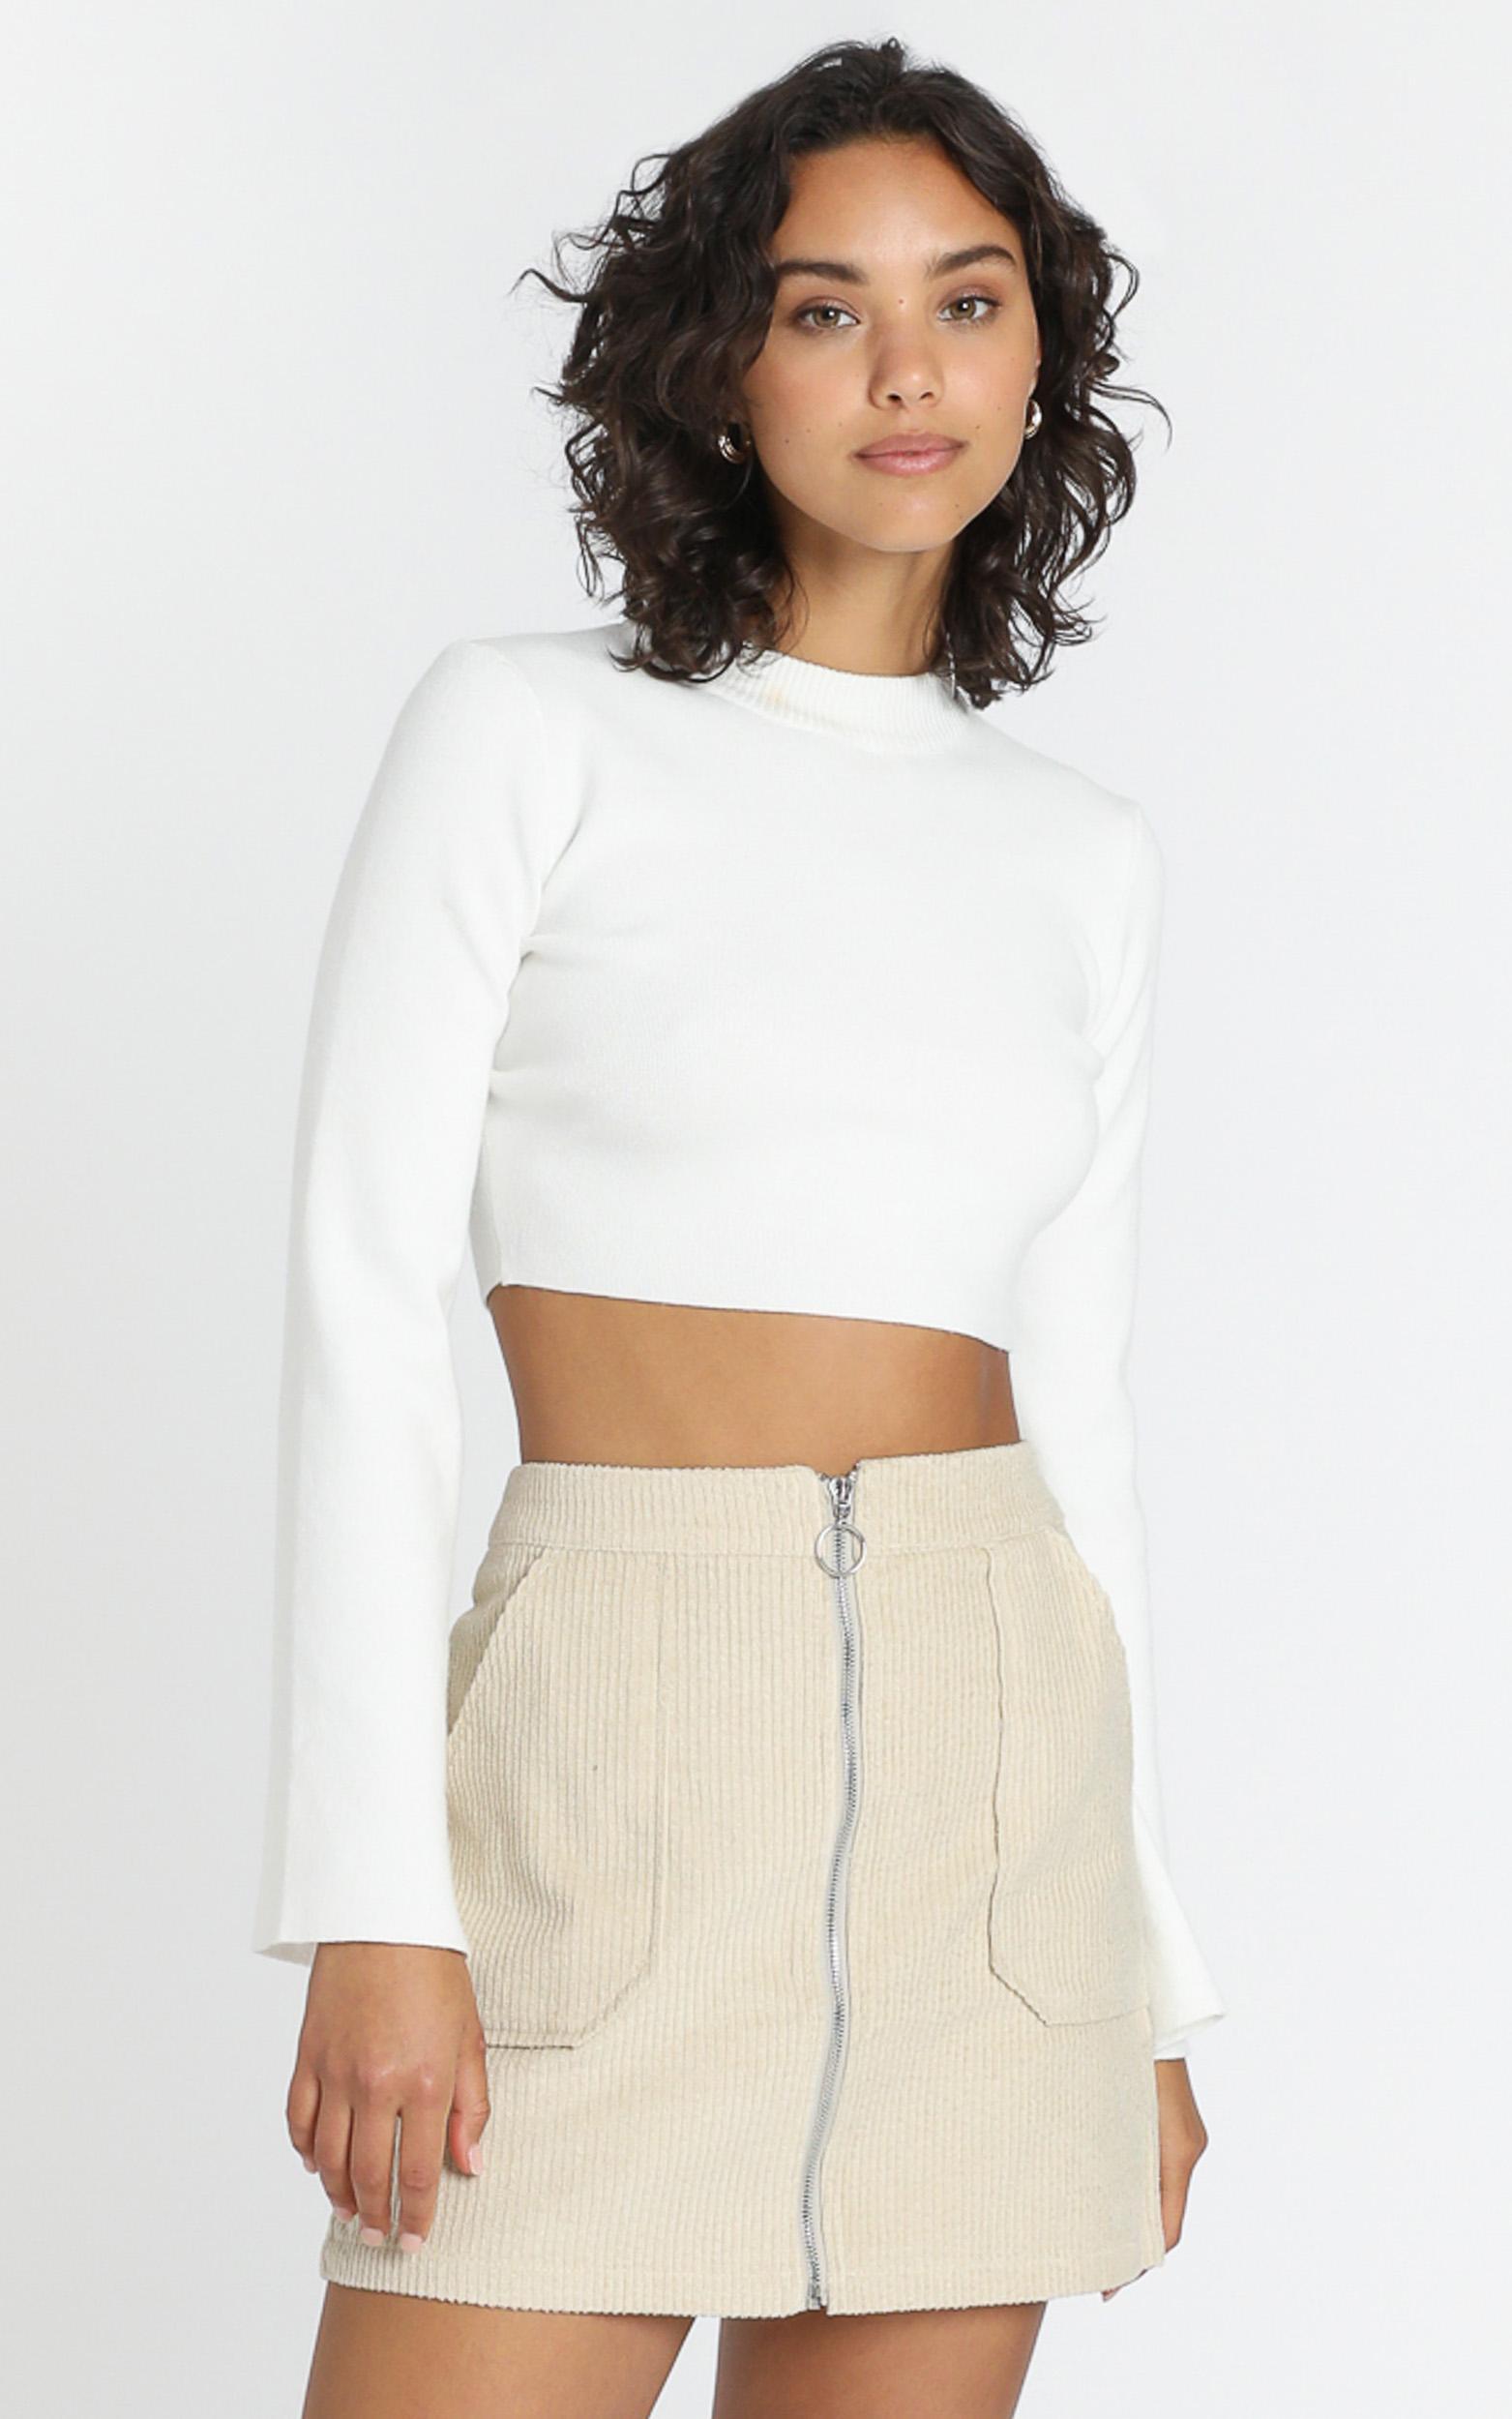 Marling Skirt in Beige - 6 (XS), Beige, hi-res image number null